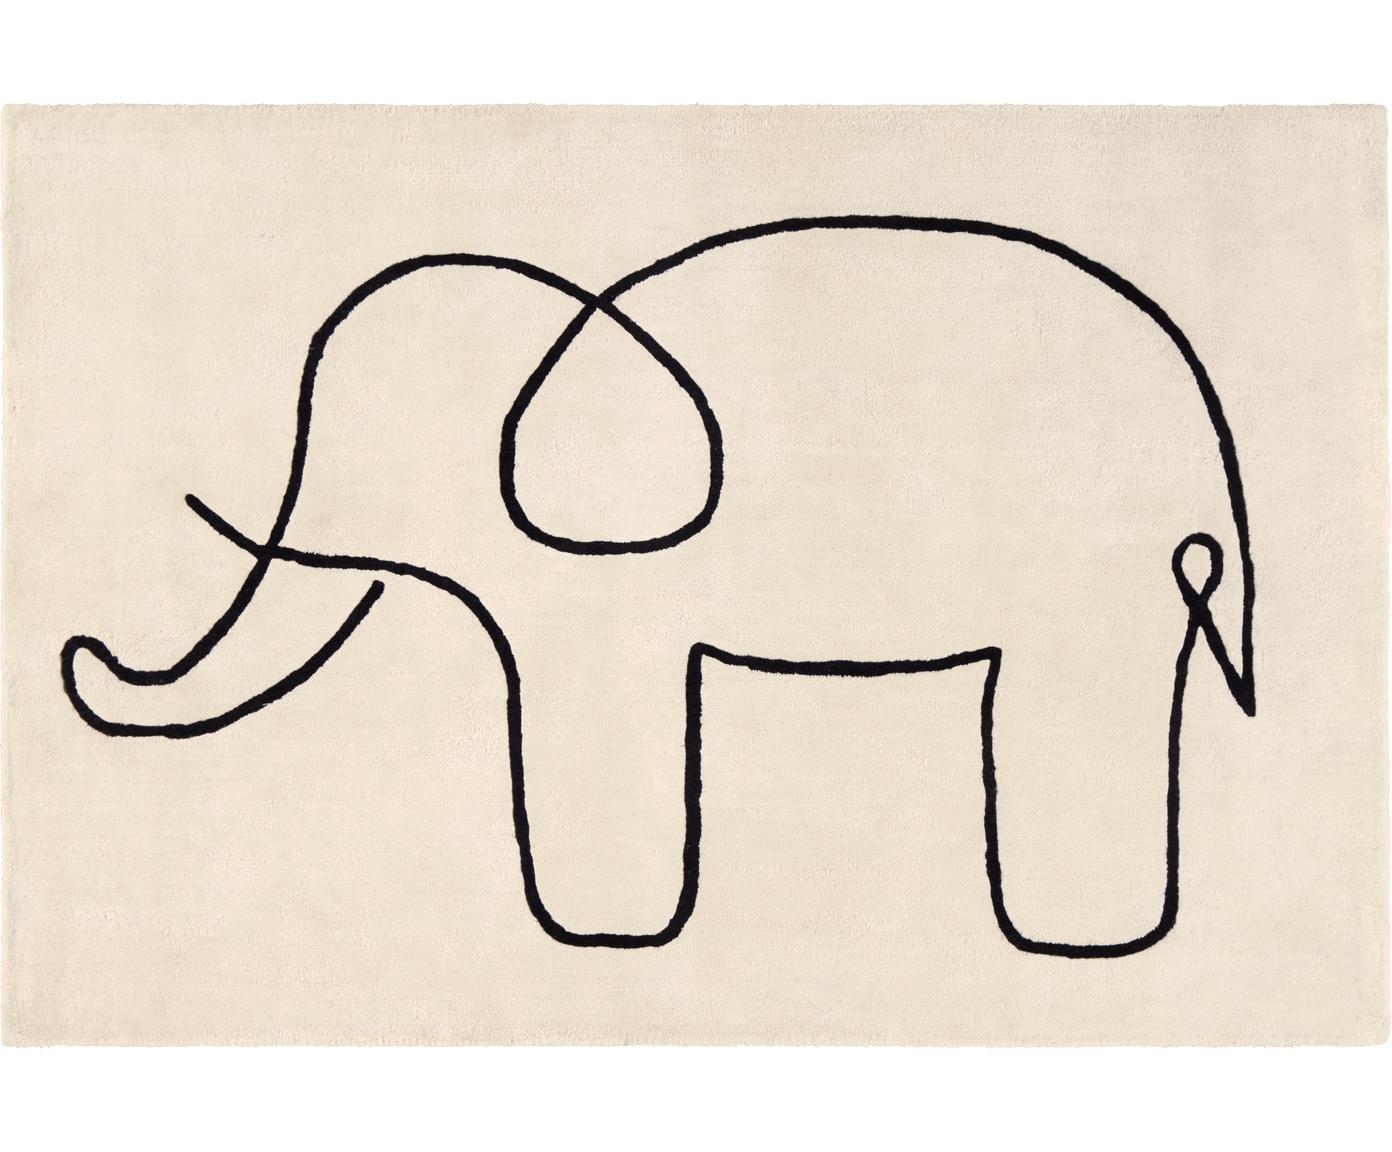 Tappeto con elefante Sketchy Elephant, Viscosa, Bianco crema, nero, Larg. 130 x Lung. 190 cm